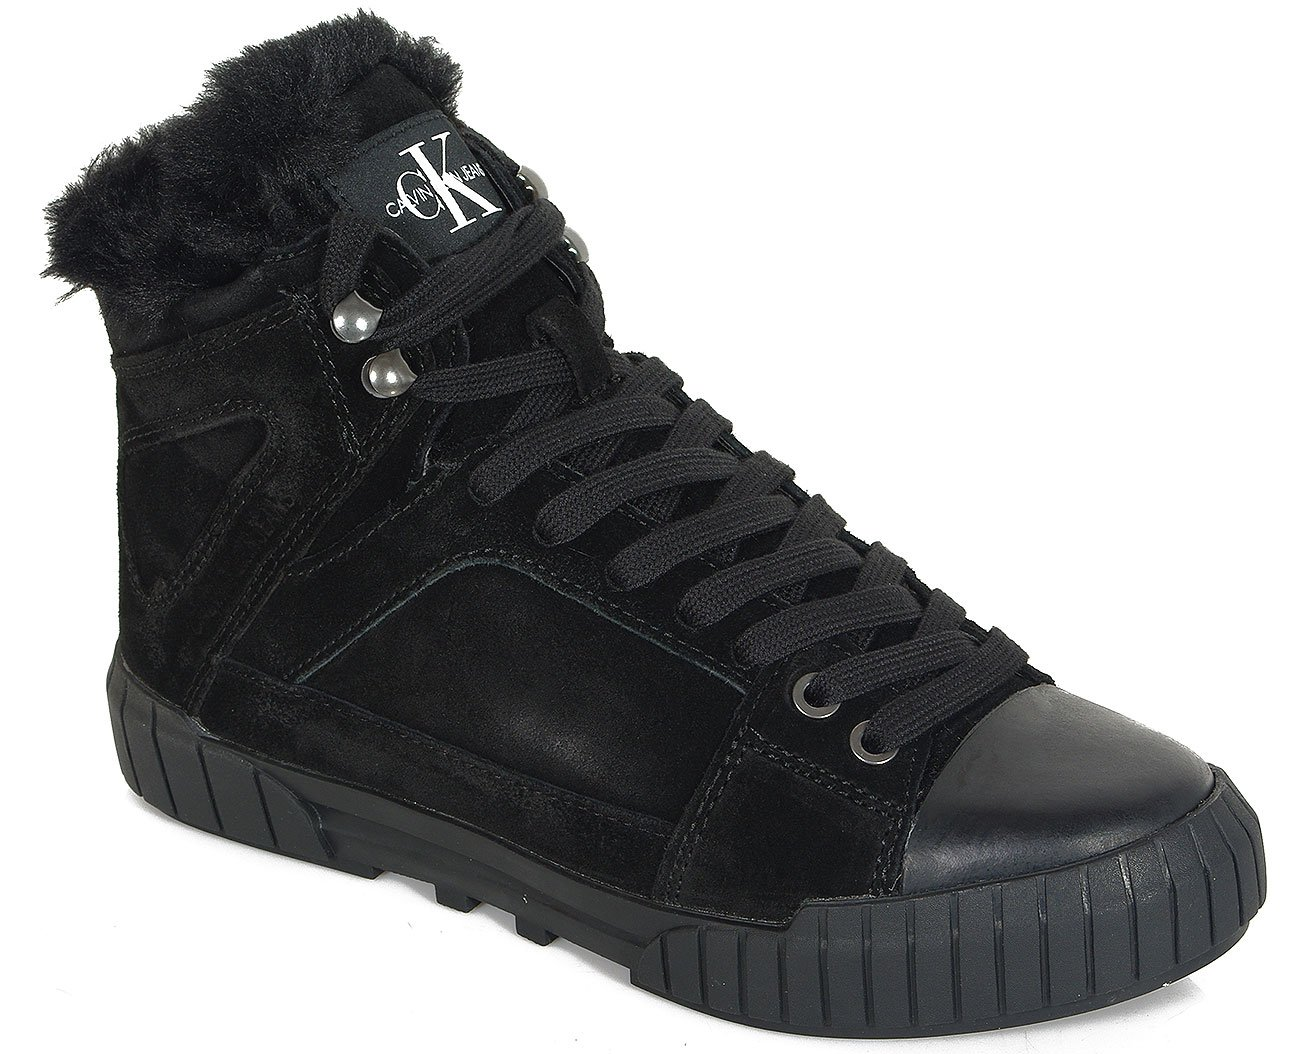 Calvin Klein Jeans Bolla sneakers suede black